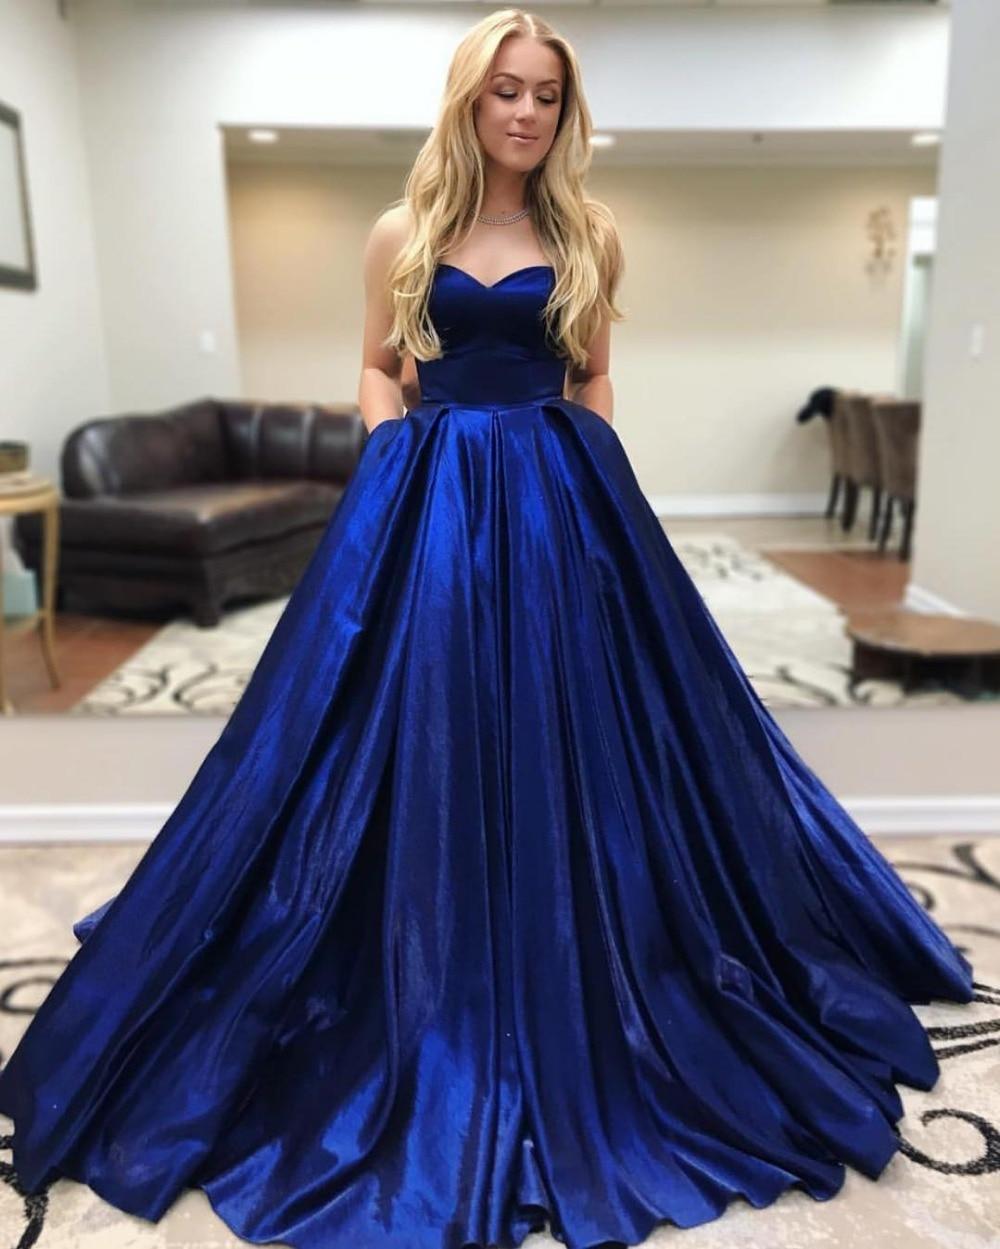 2019 New Royal Blue A Line Long Prom Dresses Sweetheart